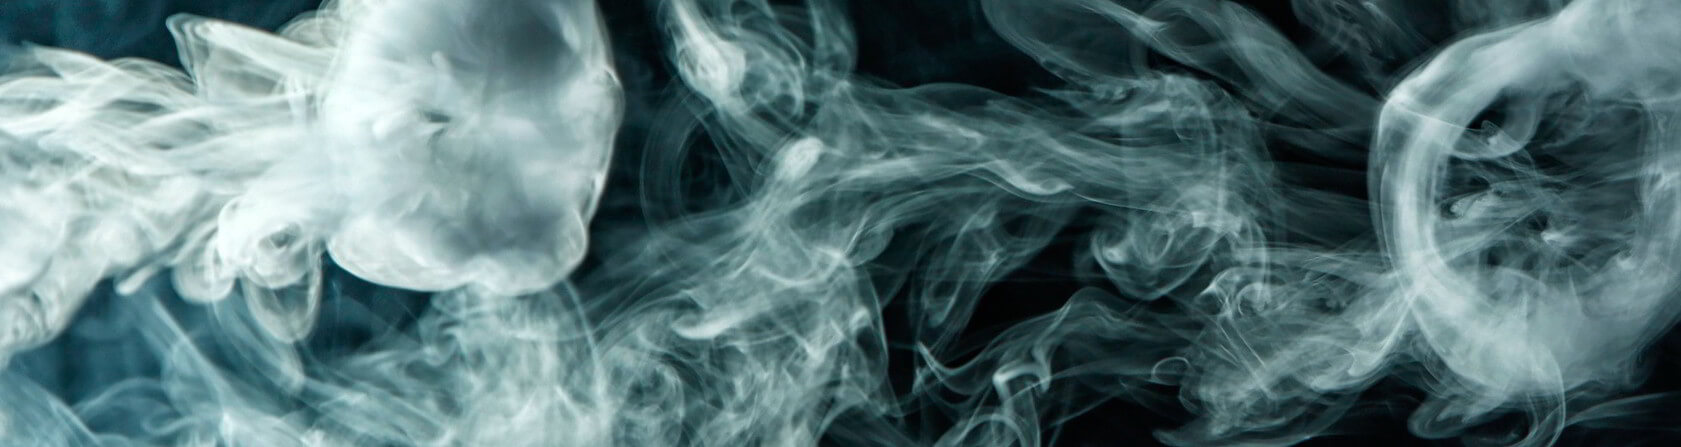 was kosten zigaretten in luxemburg